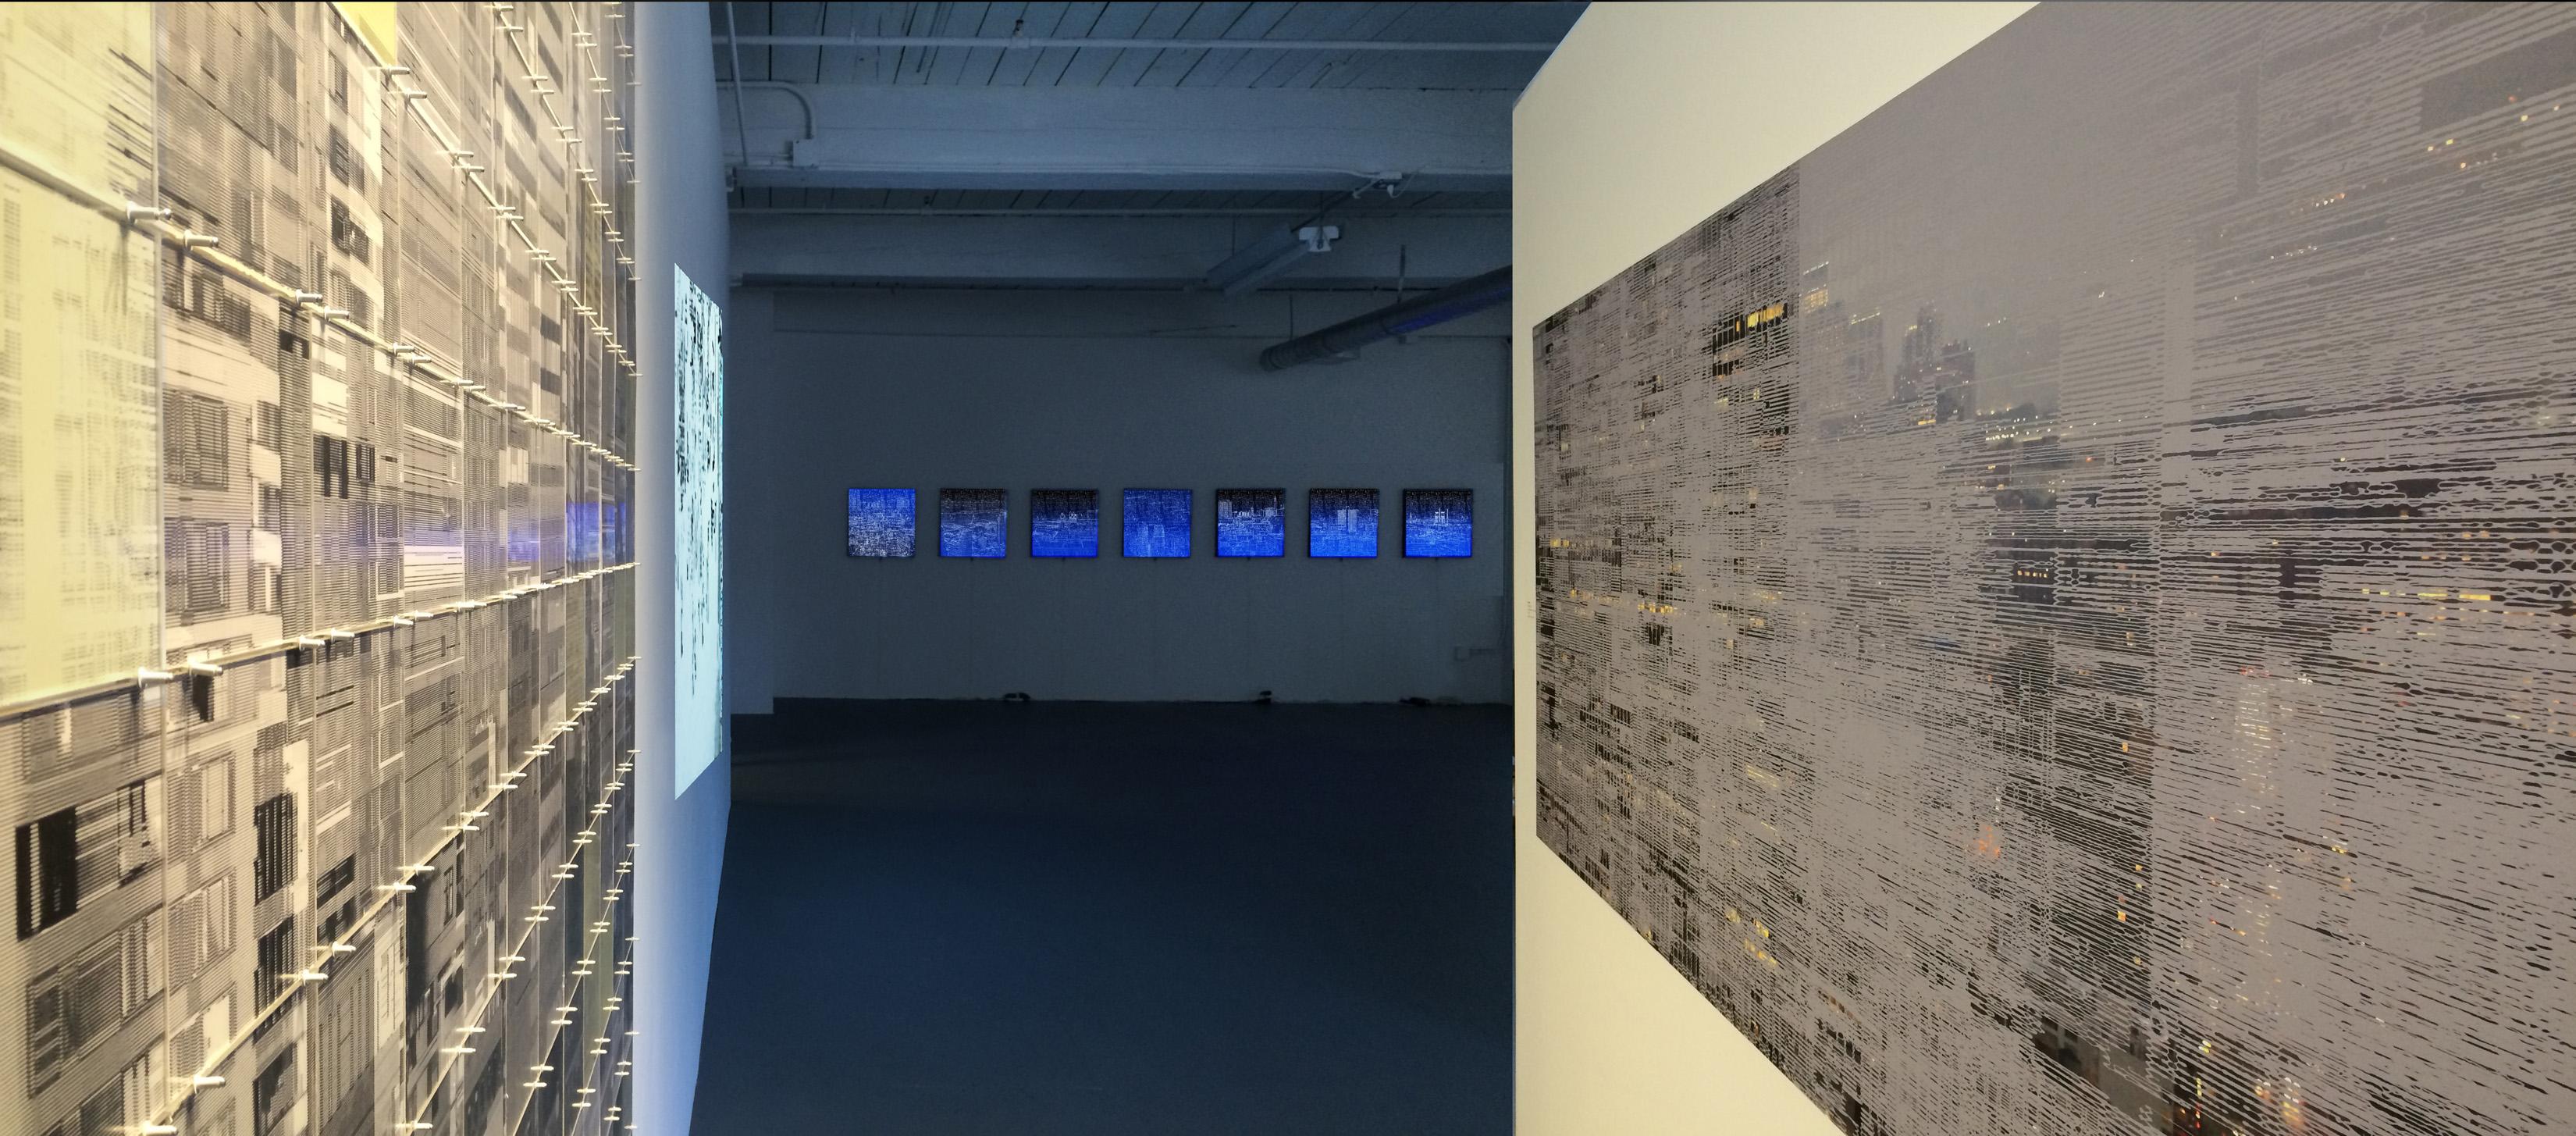 Gallery Talk with Shuli Sade